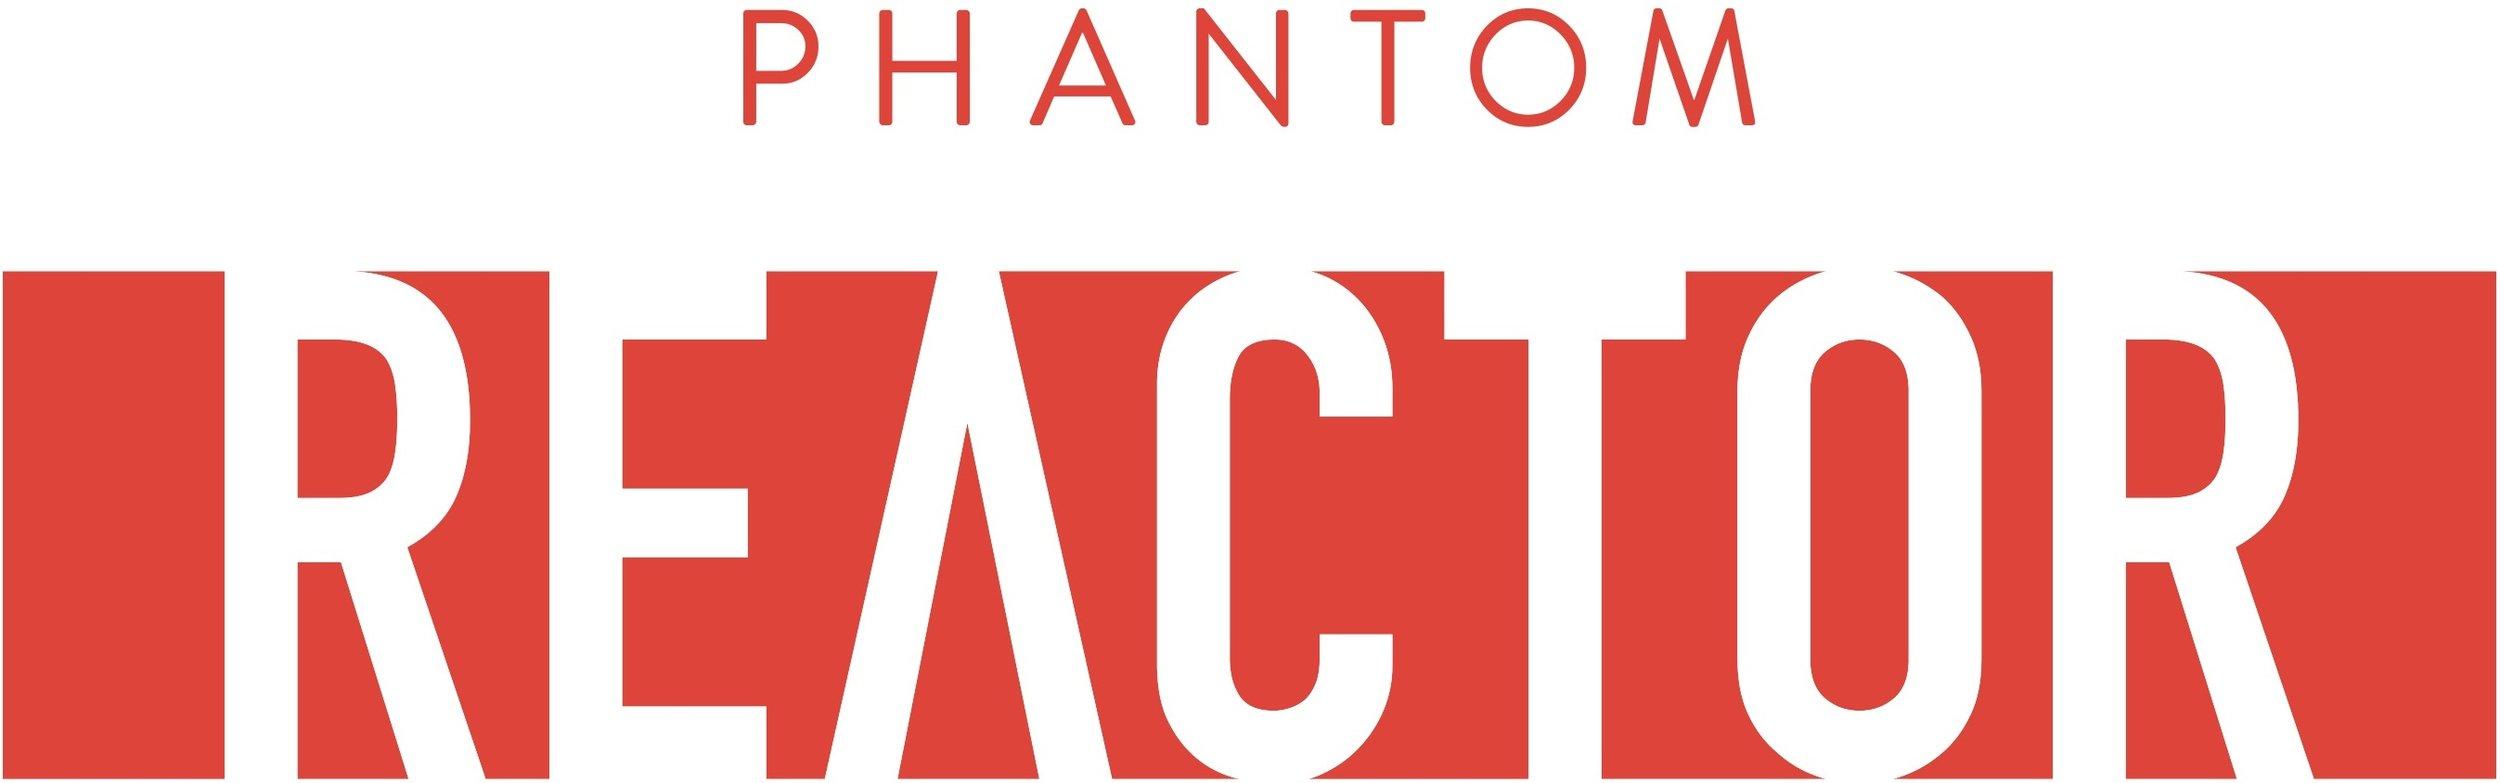 PHANTOM REACTOR Logo.jpg